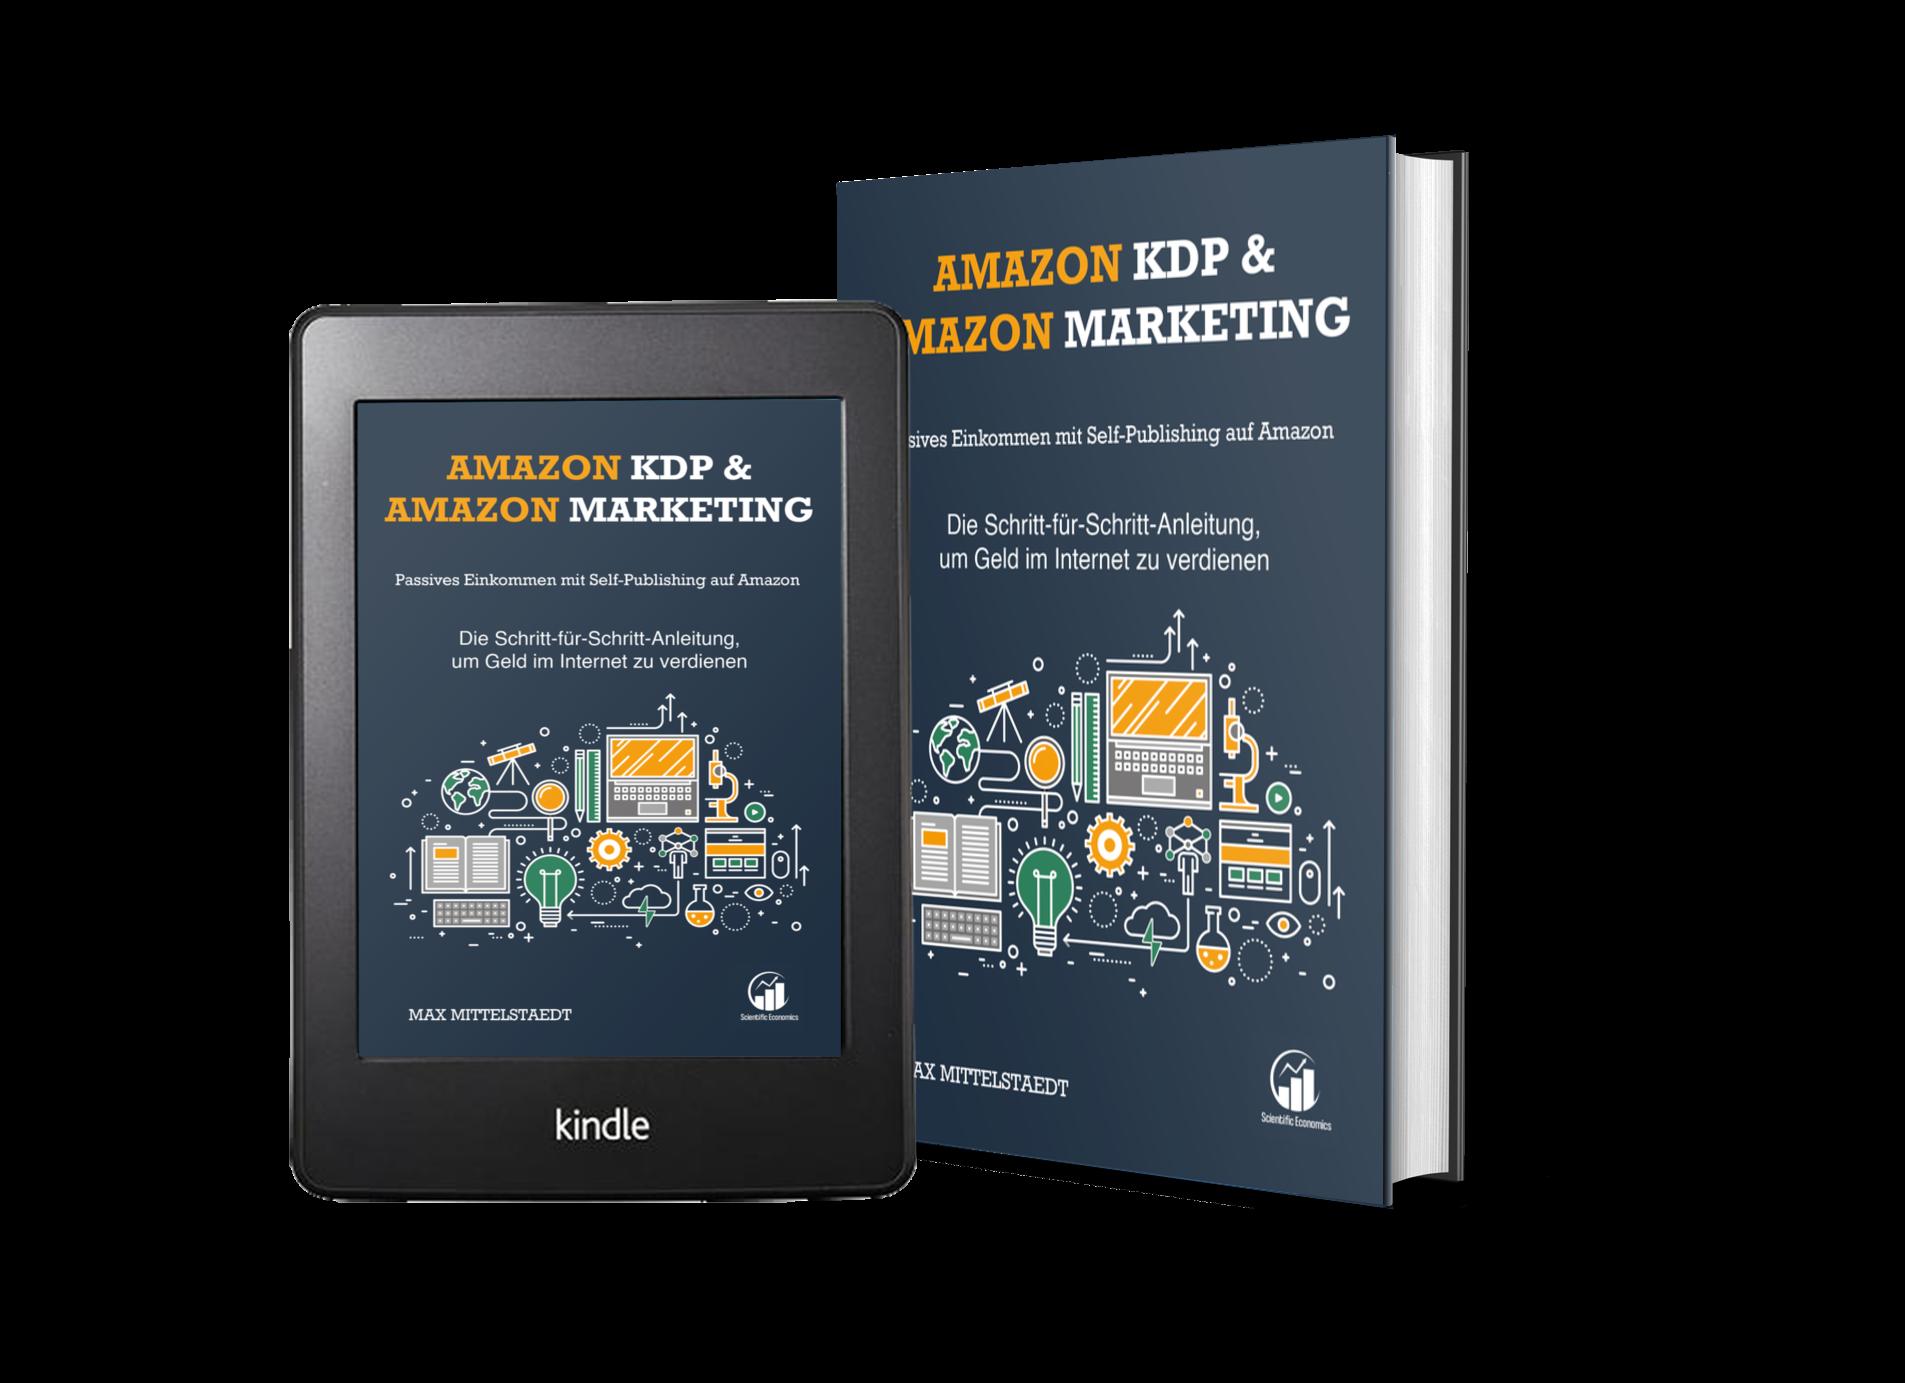 Amazon KDP Buch 3D